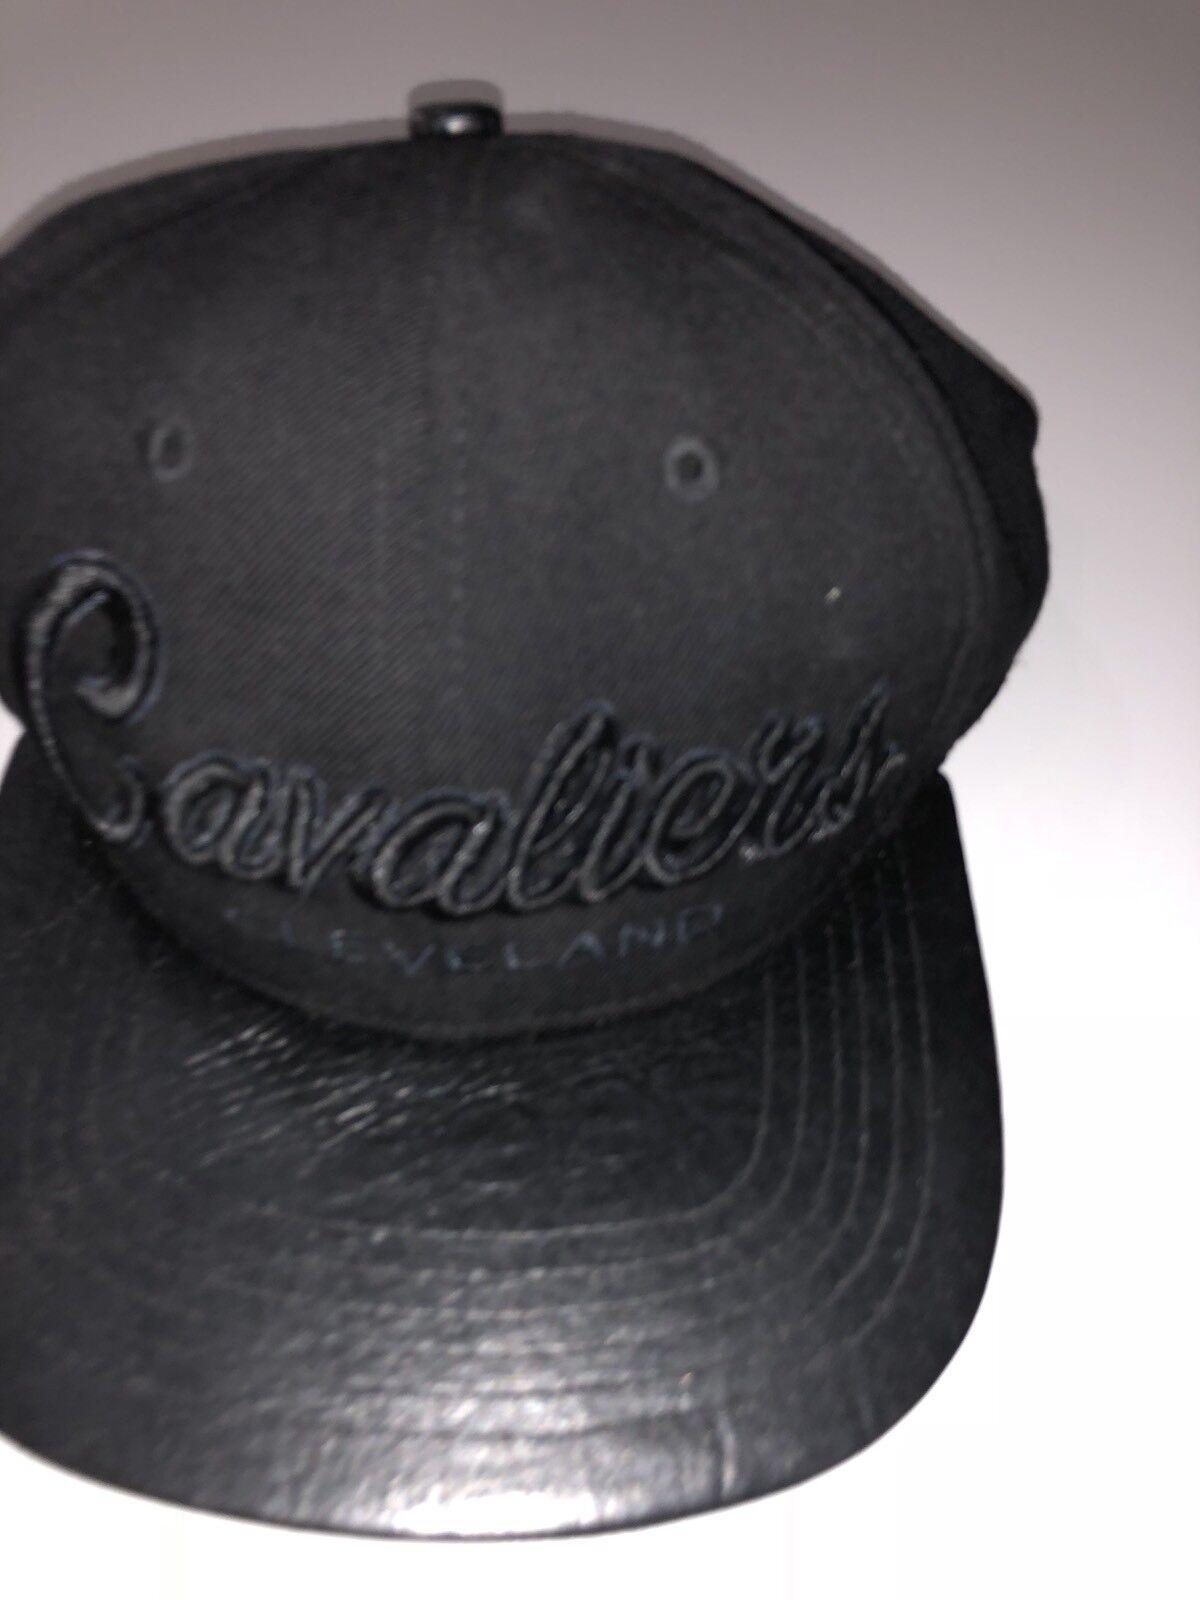 buy online b9e1c 517e7 ... black white gray ffea8 efbbd  closeout pro standard hat nba strapback cleveland  cavaliers hat standard 813712 add69 ddd69